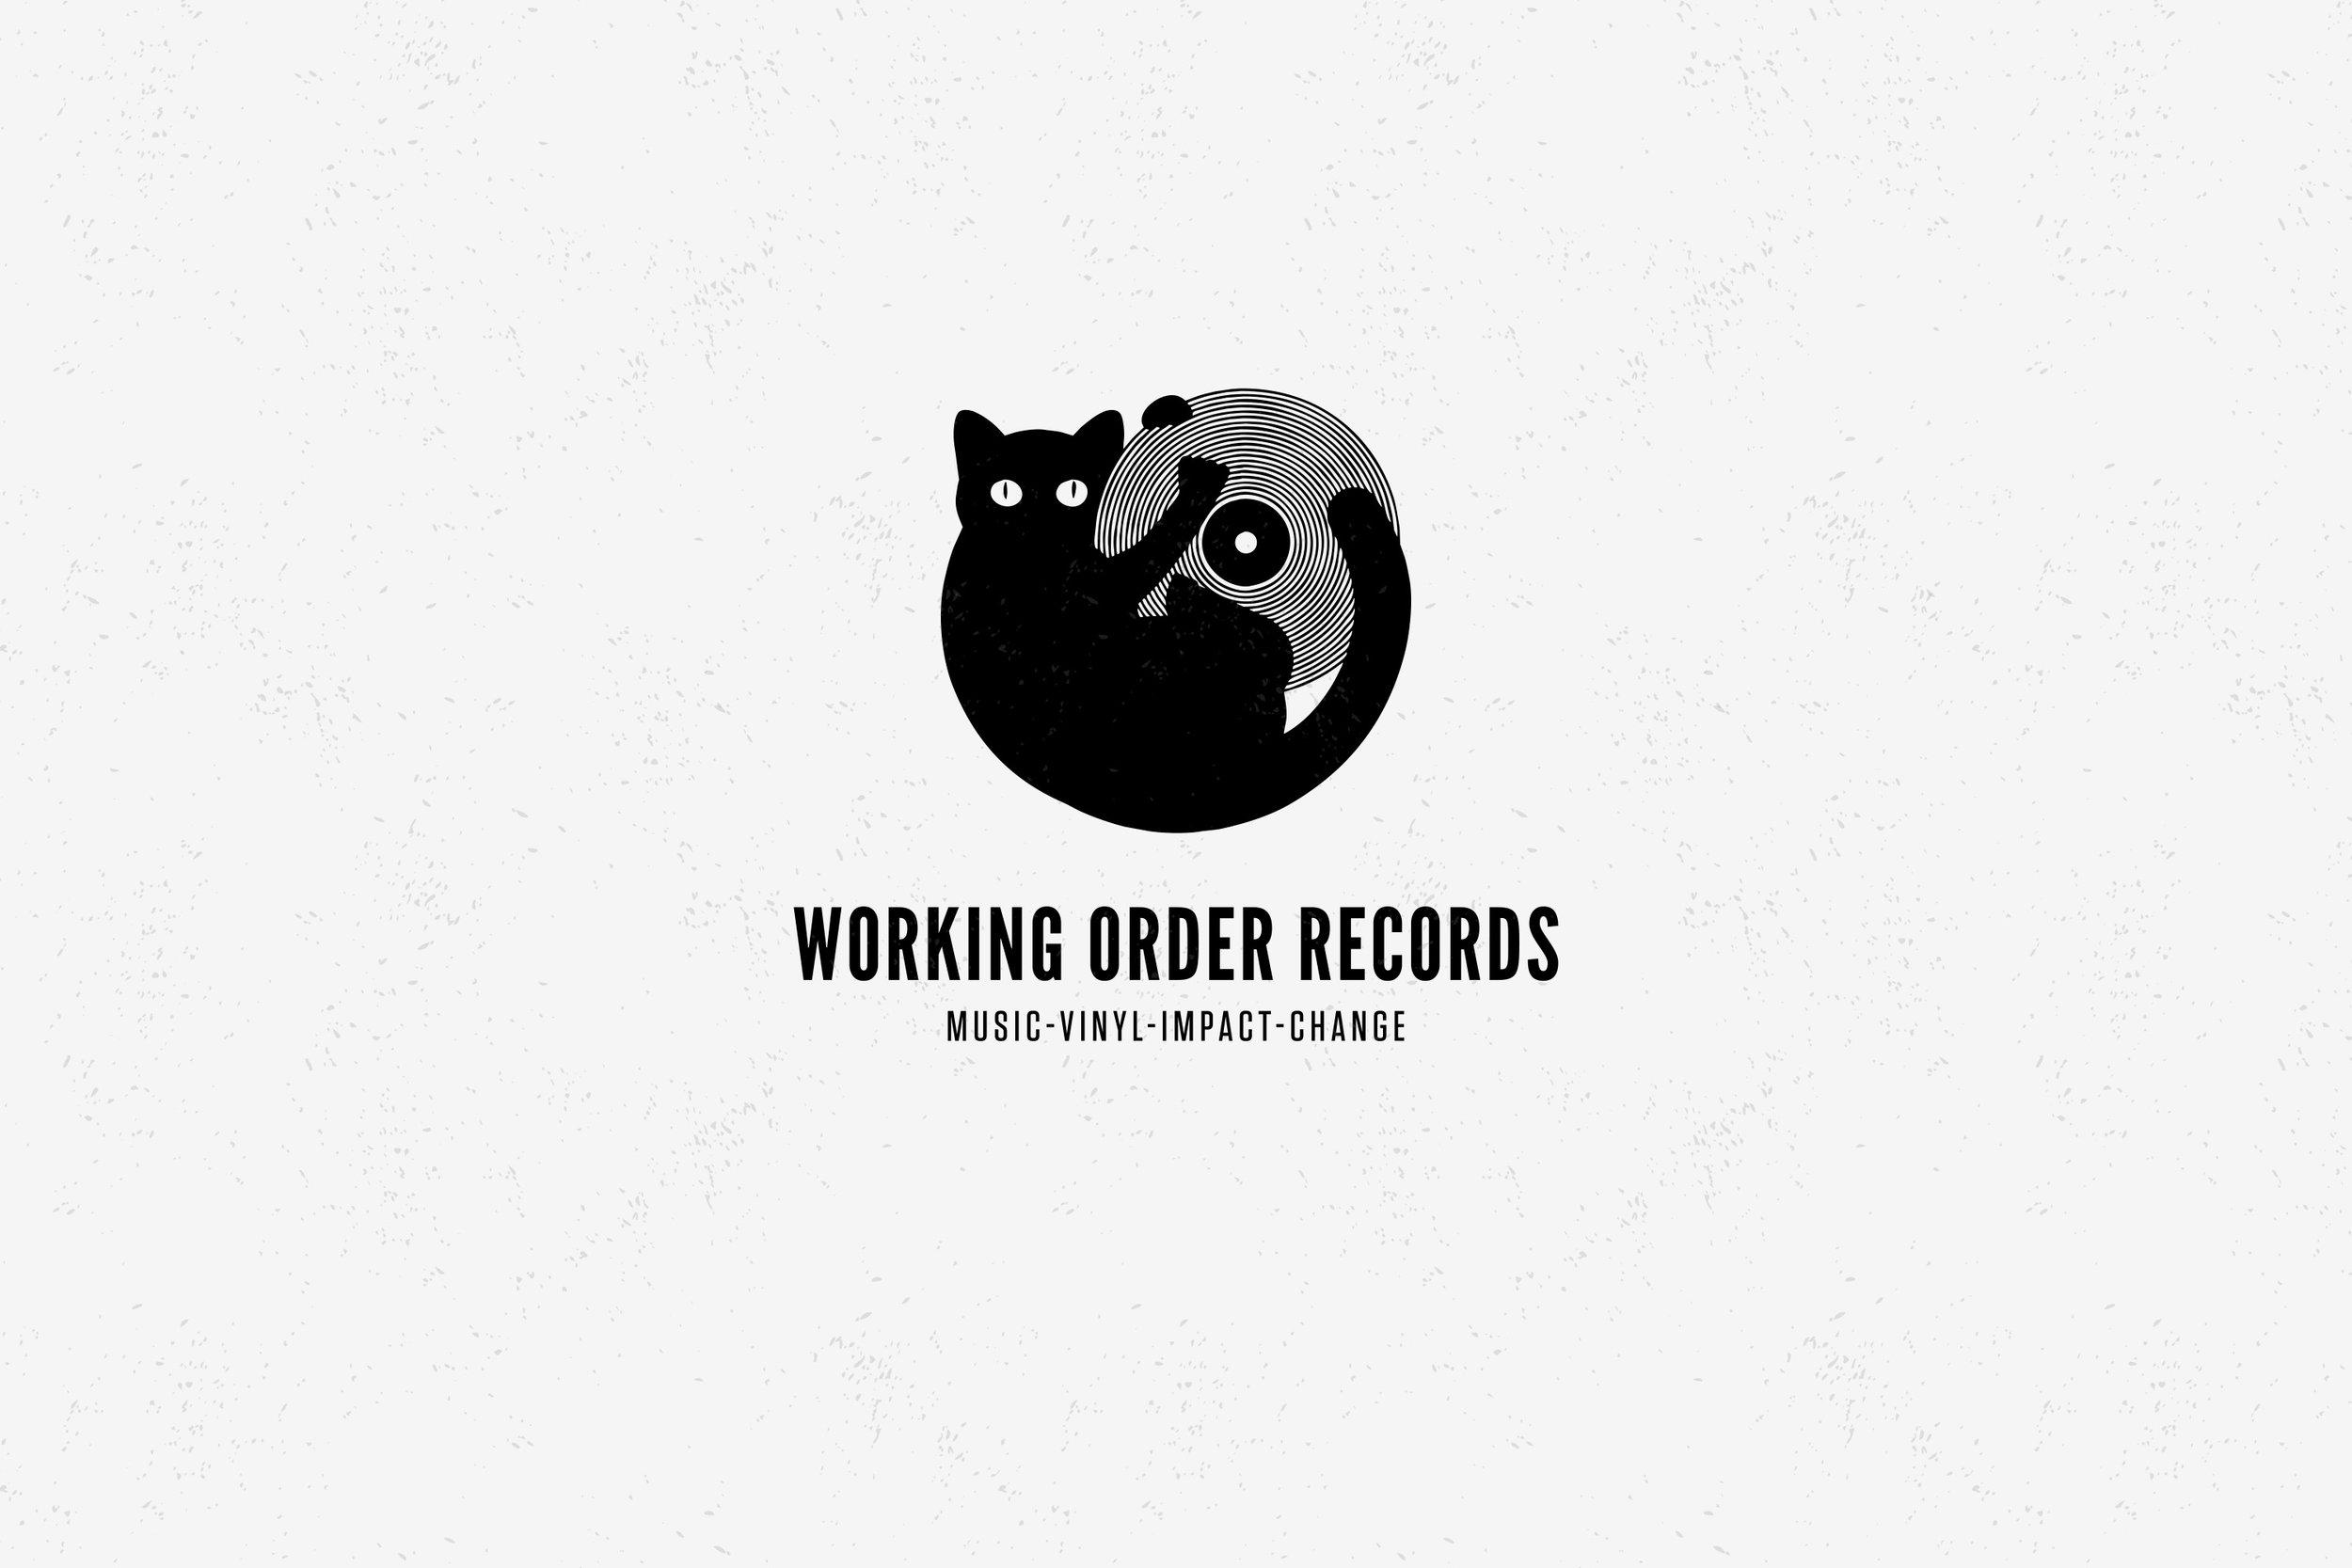 Artful-Union-Working-Order-Records-Black-Cat-Logo.jpg